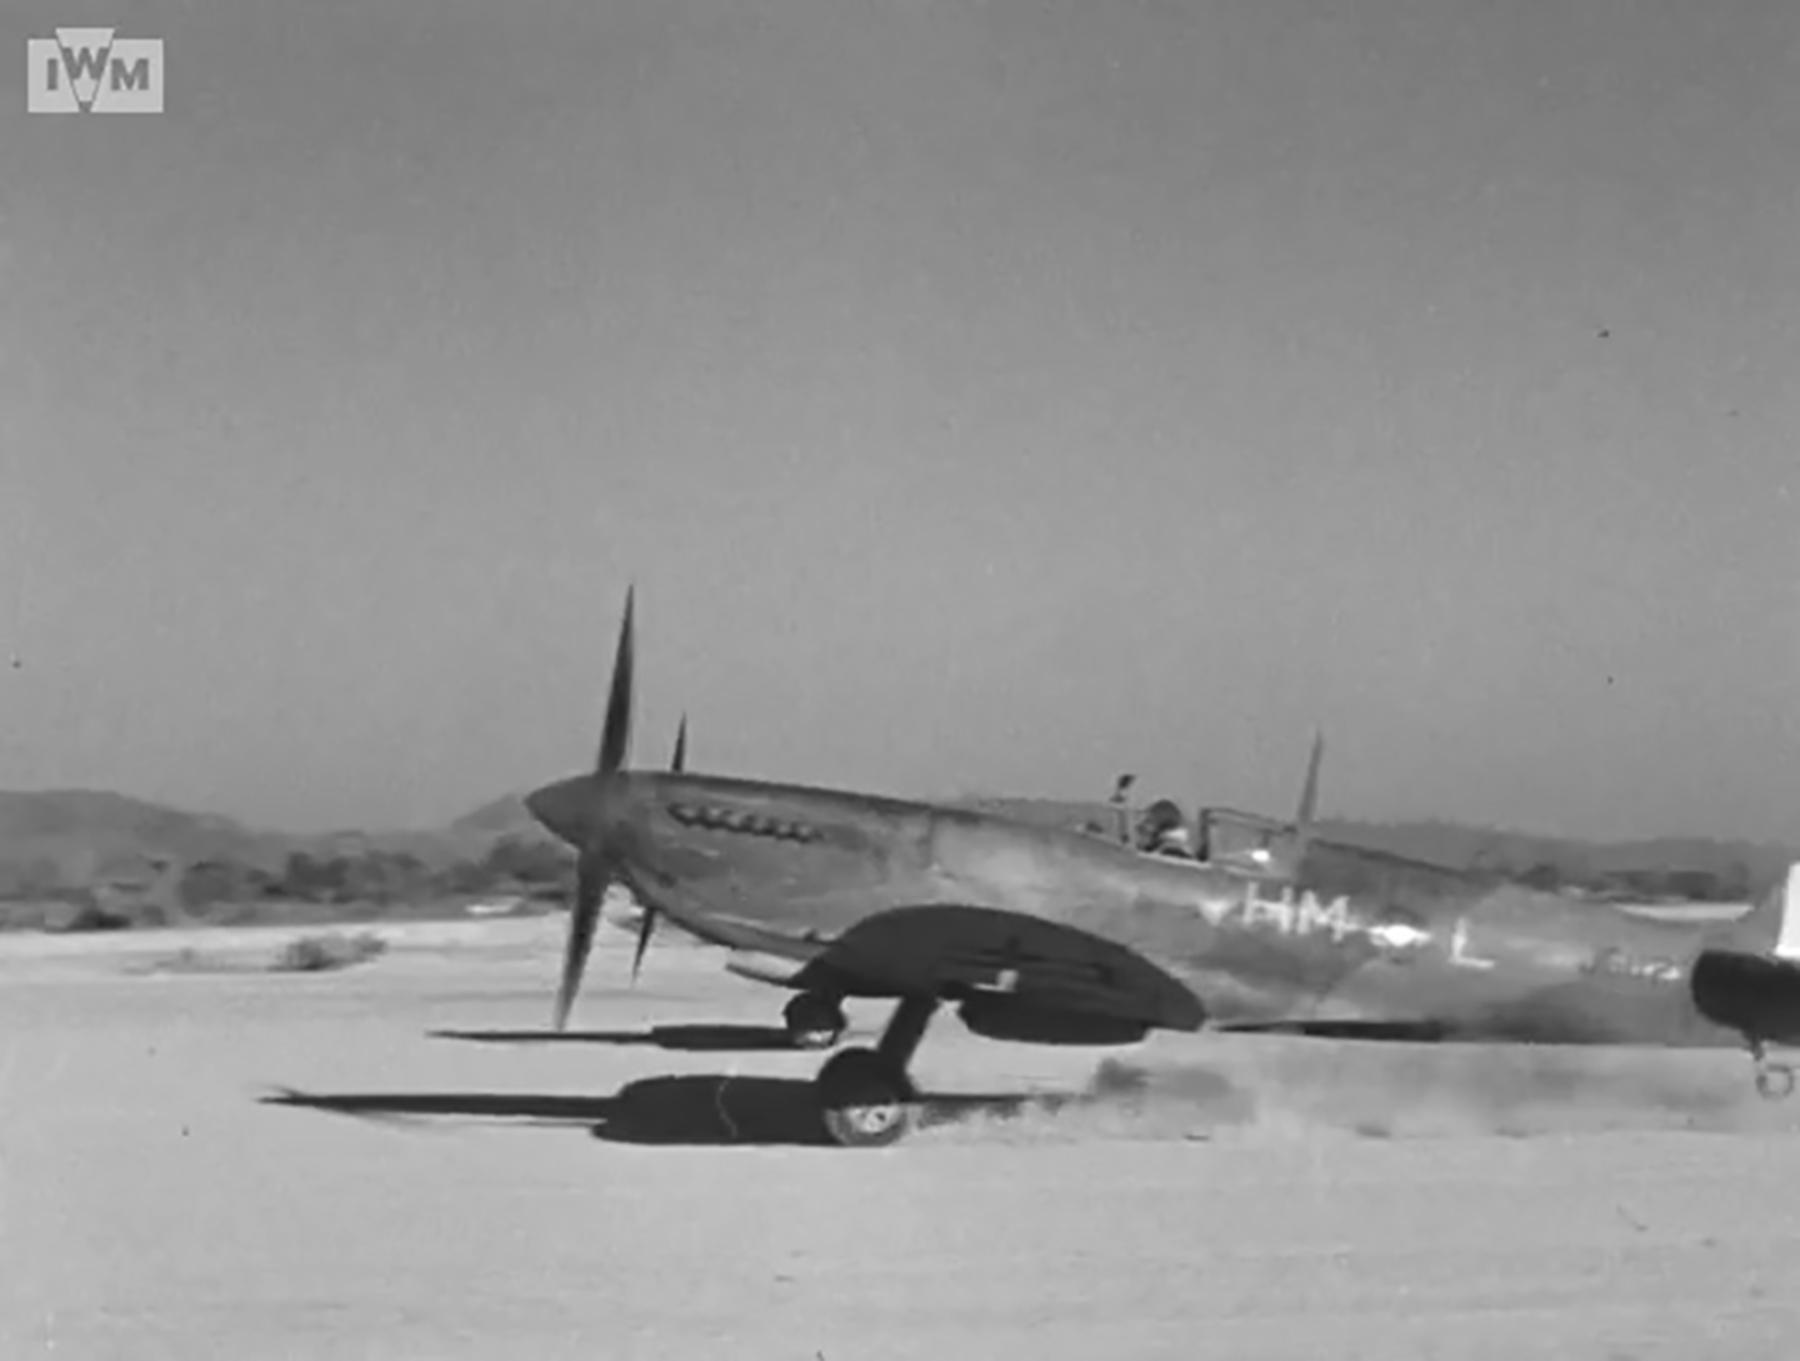 Spitfire VIII RAF 136Sqn HML JG112 at Rumkhapalong operating over Burma CBI 1944 IWM 02